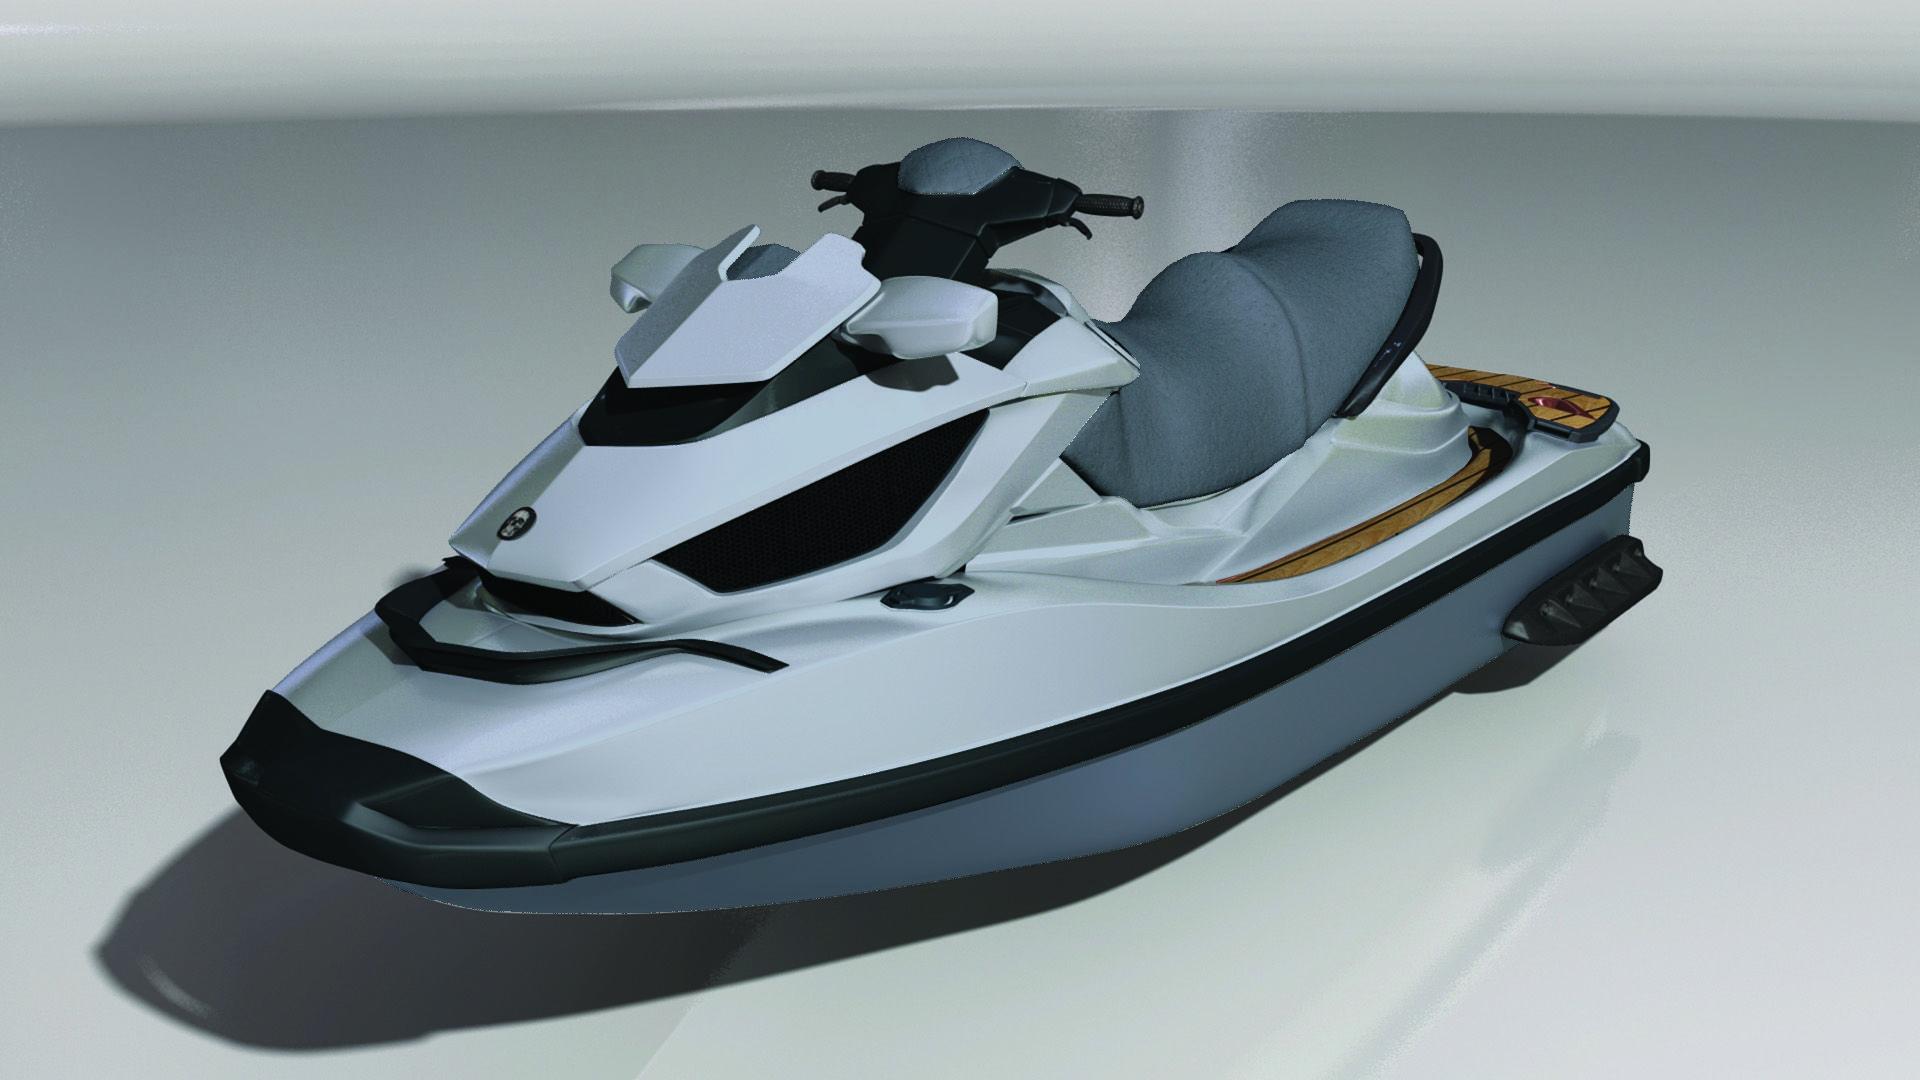 Pin on jetski and yacht